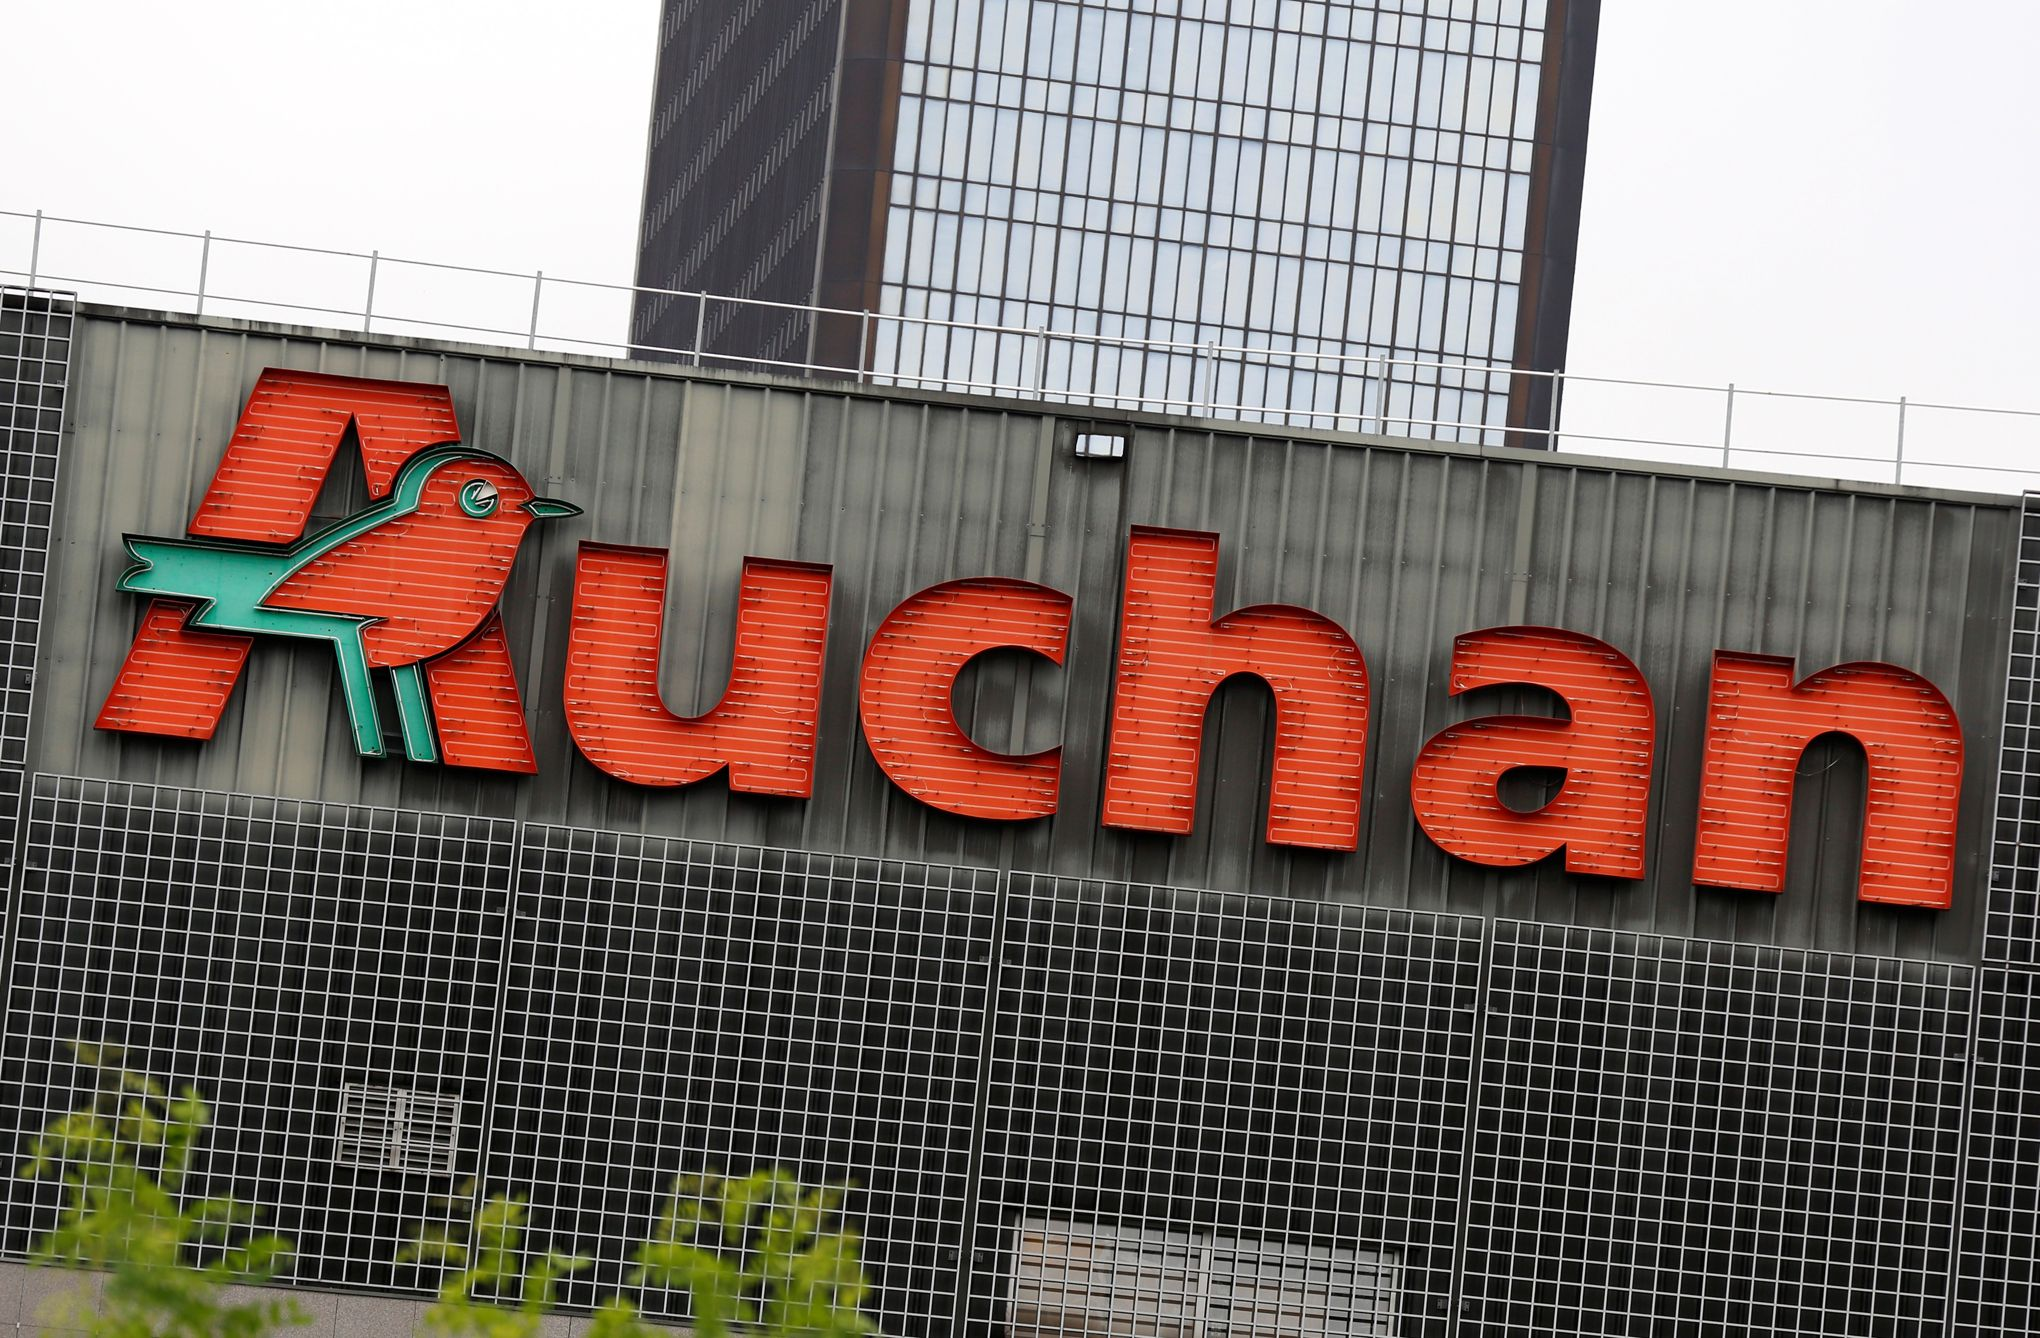 Stunning prix petrole auchan with prix petrole auchan - Auchan recrute fr ...